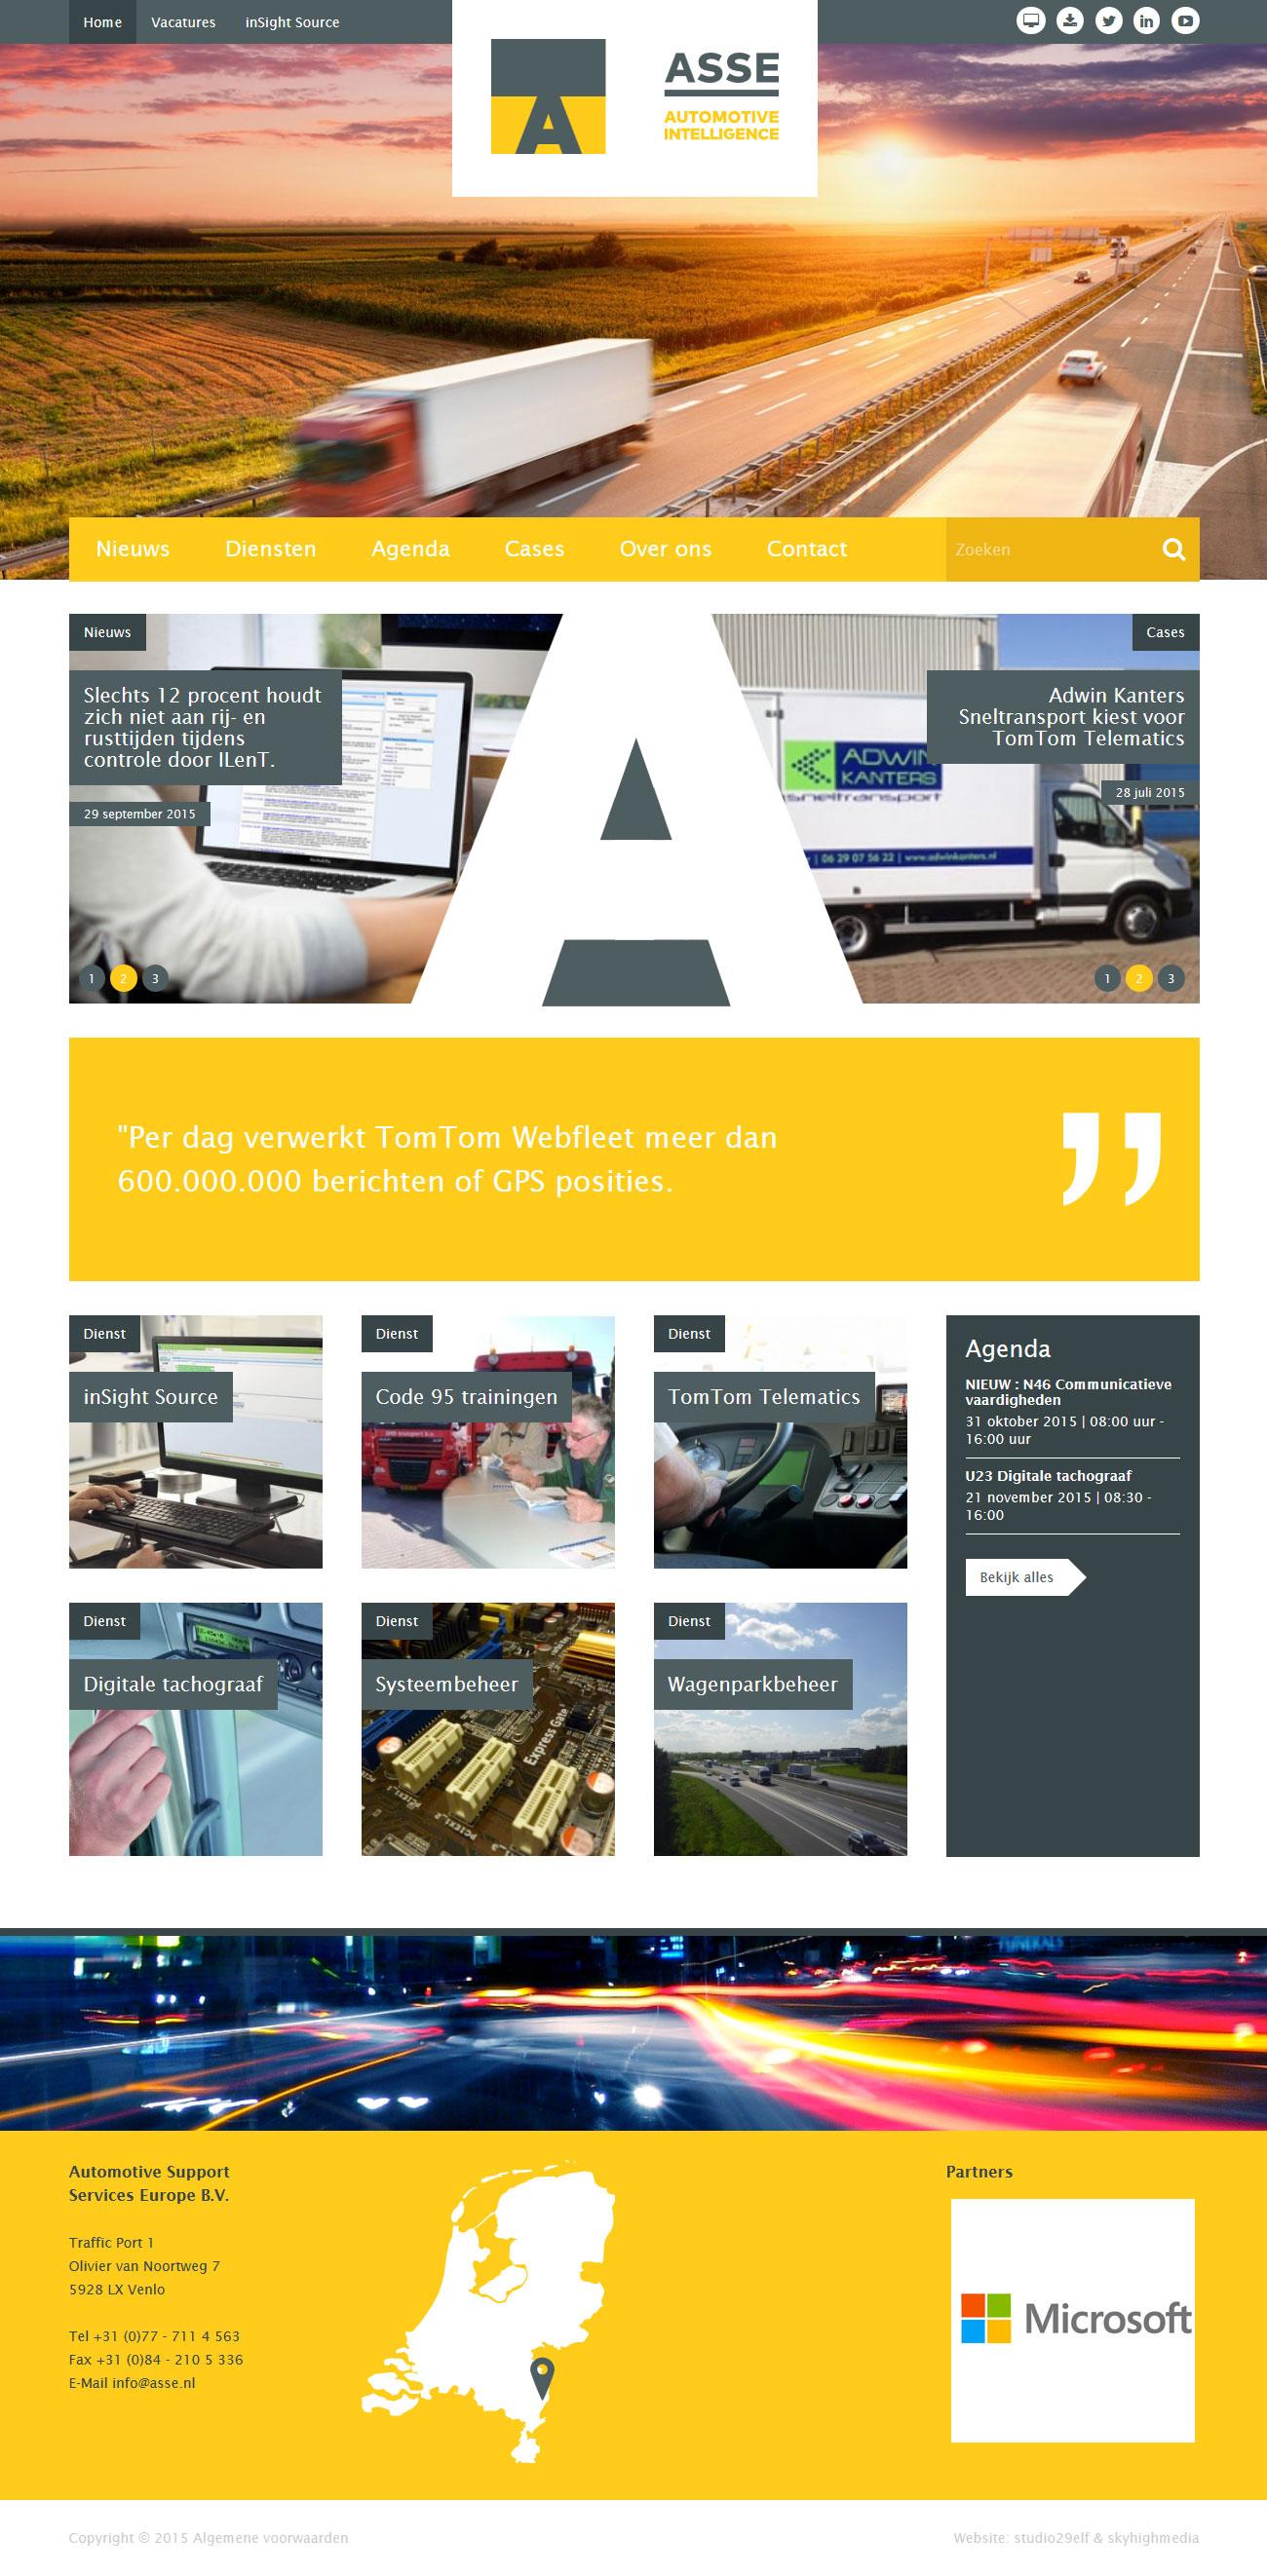 asse_website1